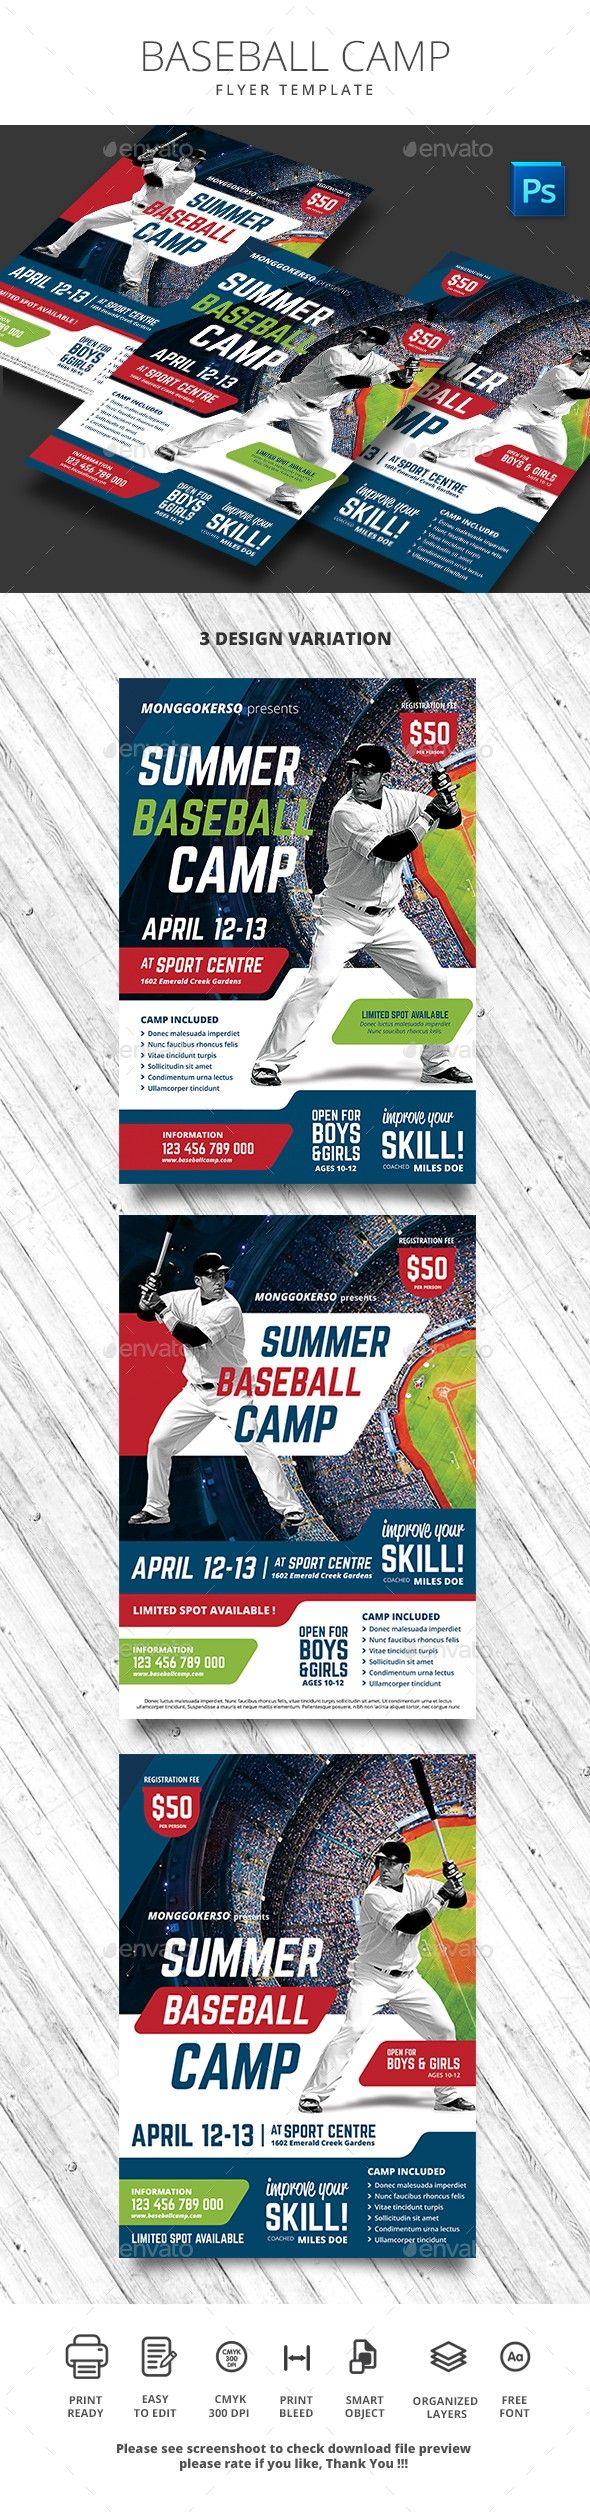 A4 Ad Advert Ball Baseball Bat Boy Camp Camps Cap Challenge Championship Club Coach Coaching Event Flyer G Baseball Camp Sports Flyer Baseball